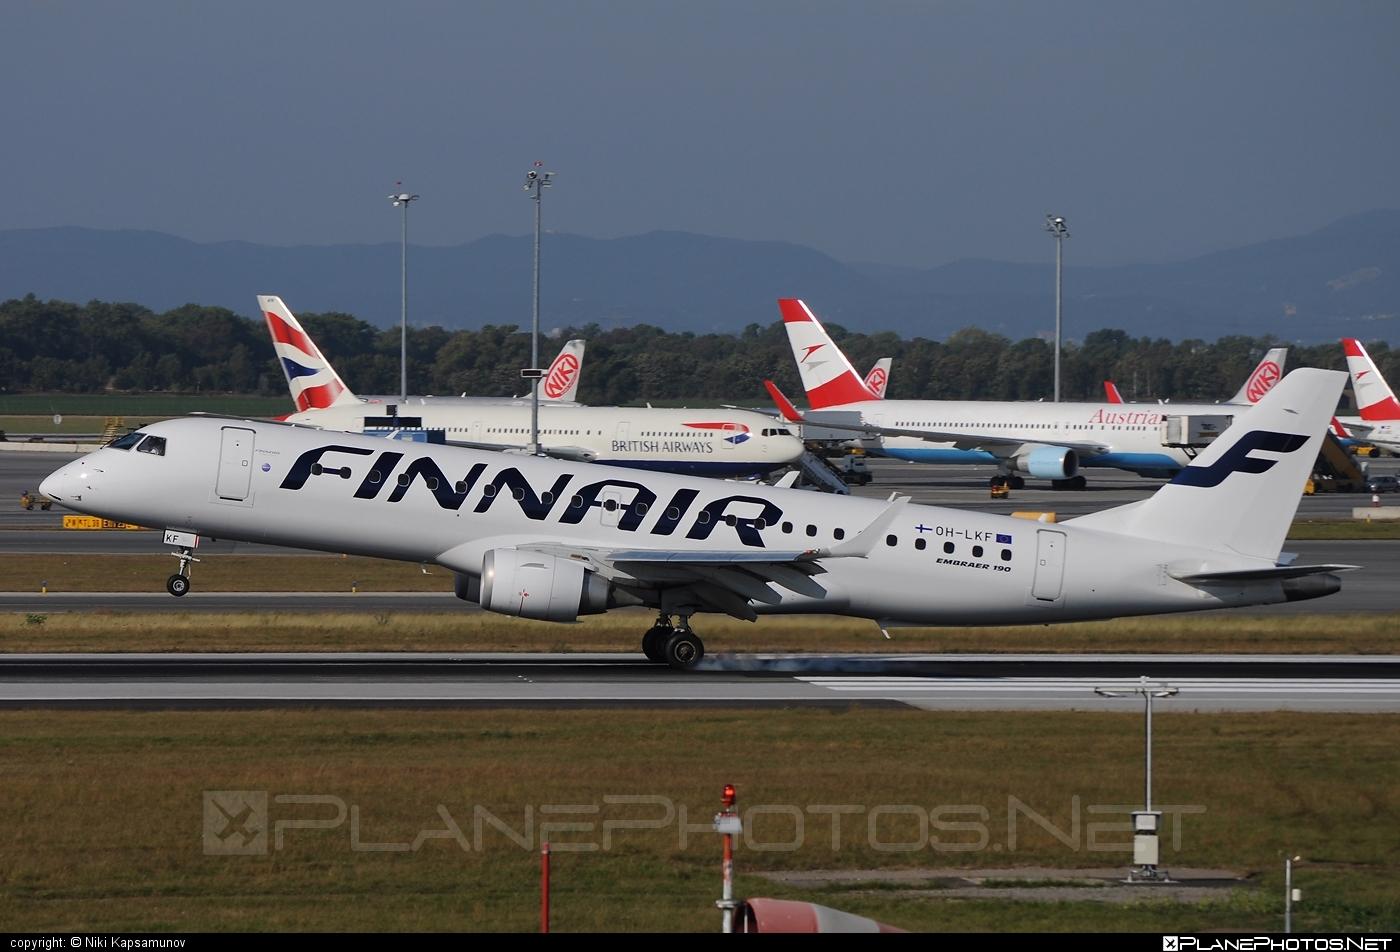 Embraer E190LR (ERJ-190-100LR) - OH-LKF operated by Finnair #e190 #e190100 #e190100lr #e190lr #embraer #embraer190 #embraer190100lr #embraer190lr #finnair